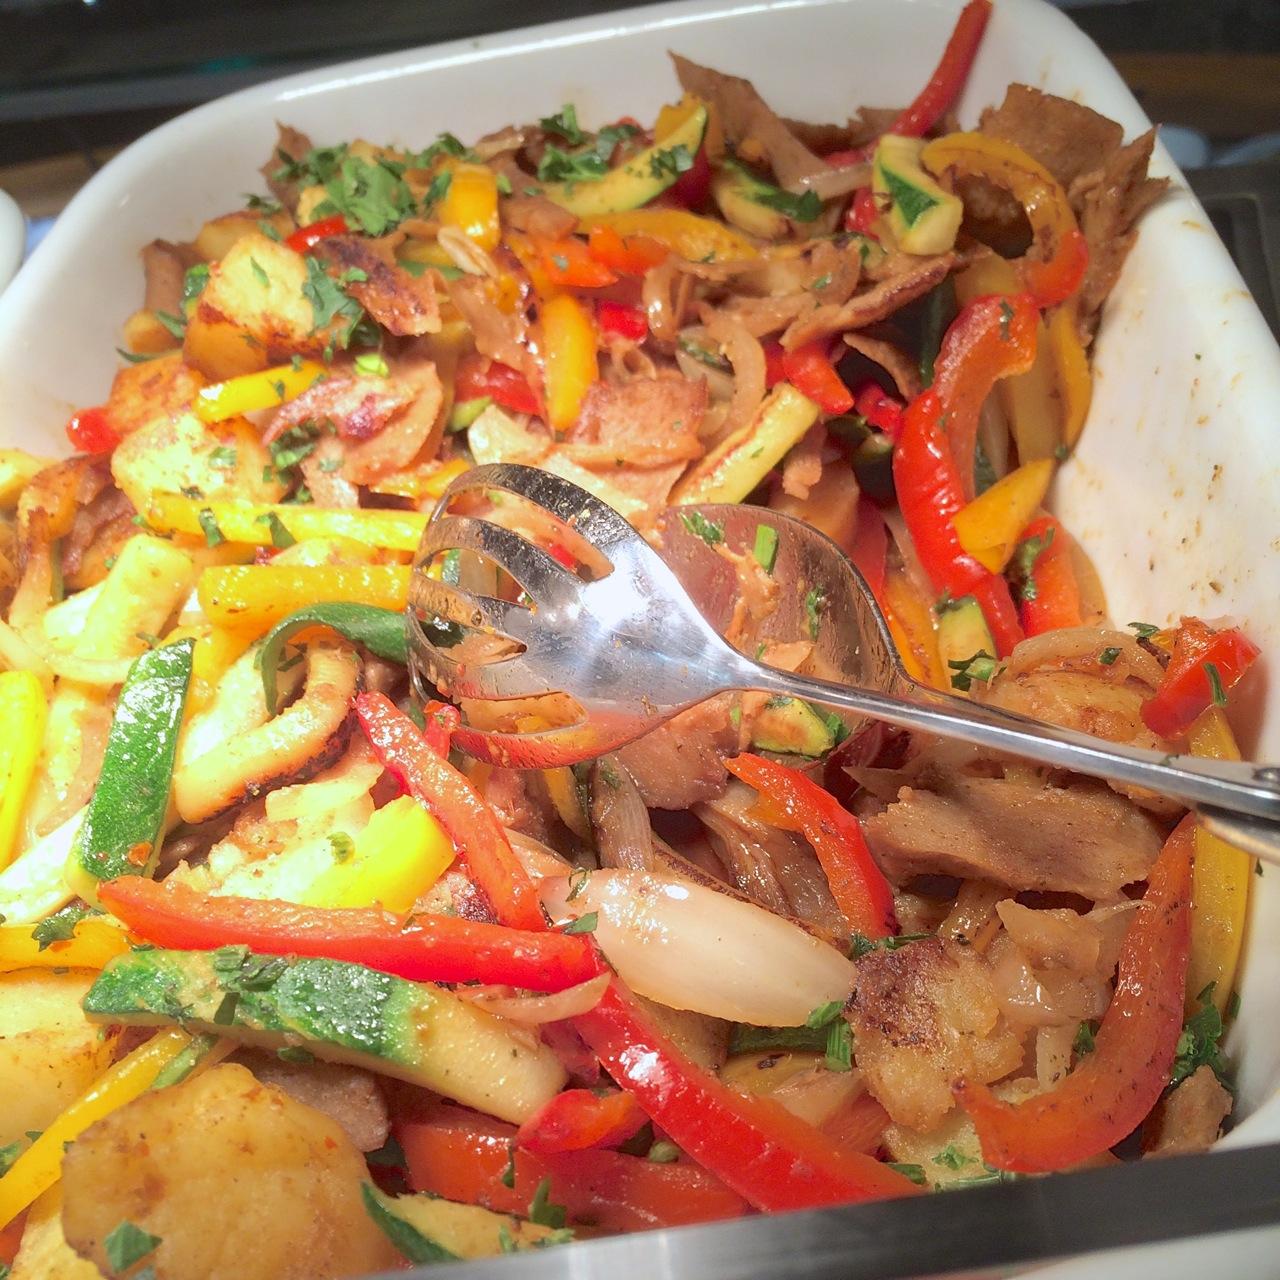 http://fatgayvegan.com/wp-content/uploads/2015/08/seitan-kebab-stir-fry.jpg